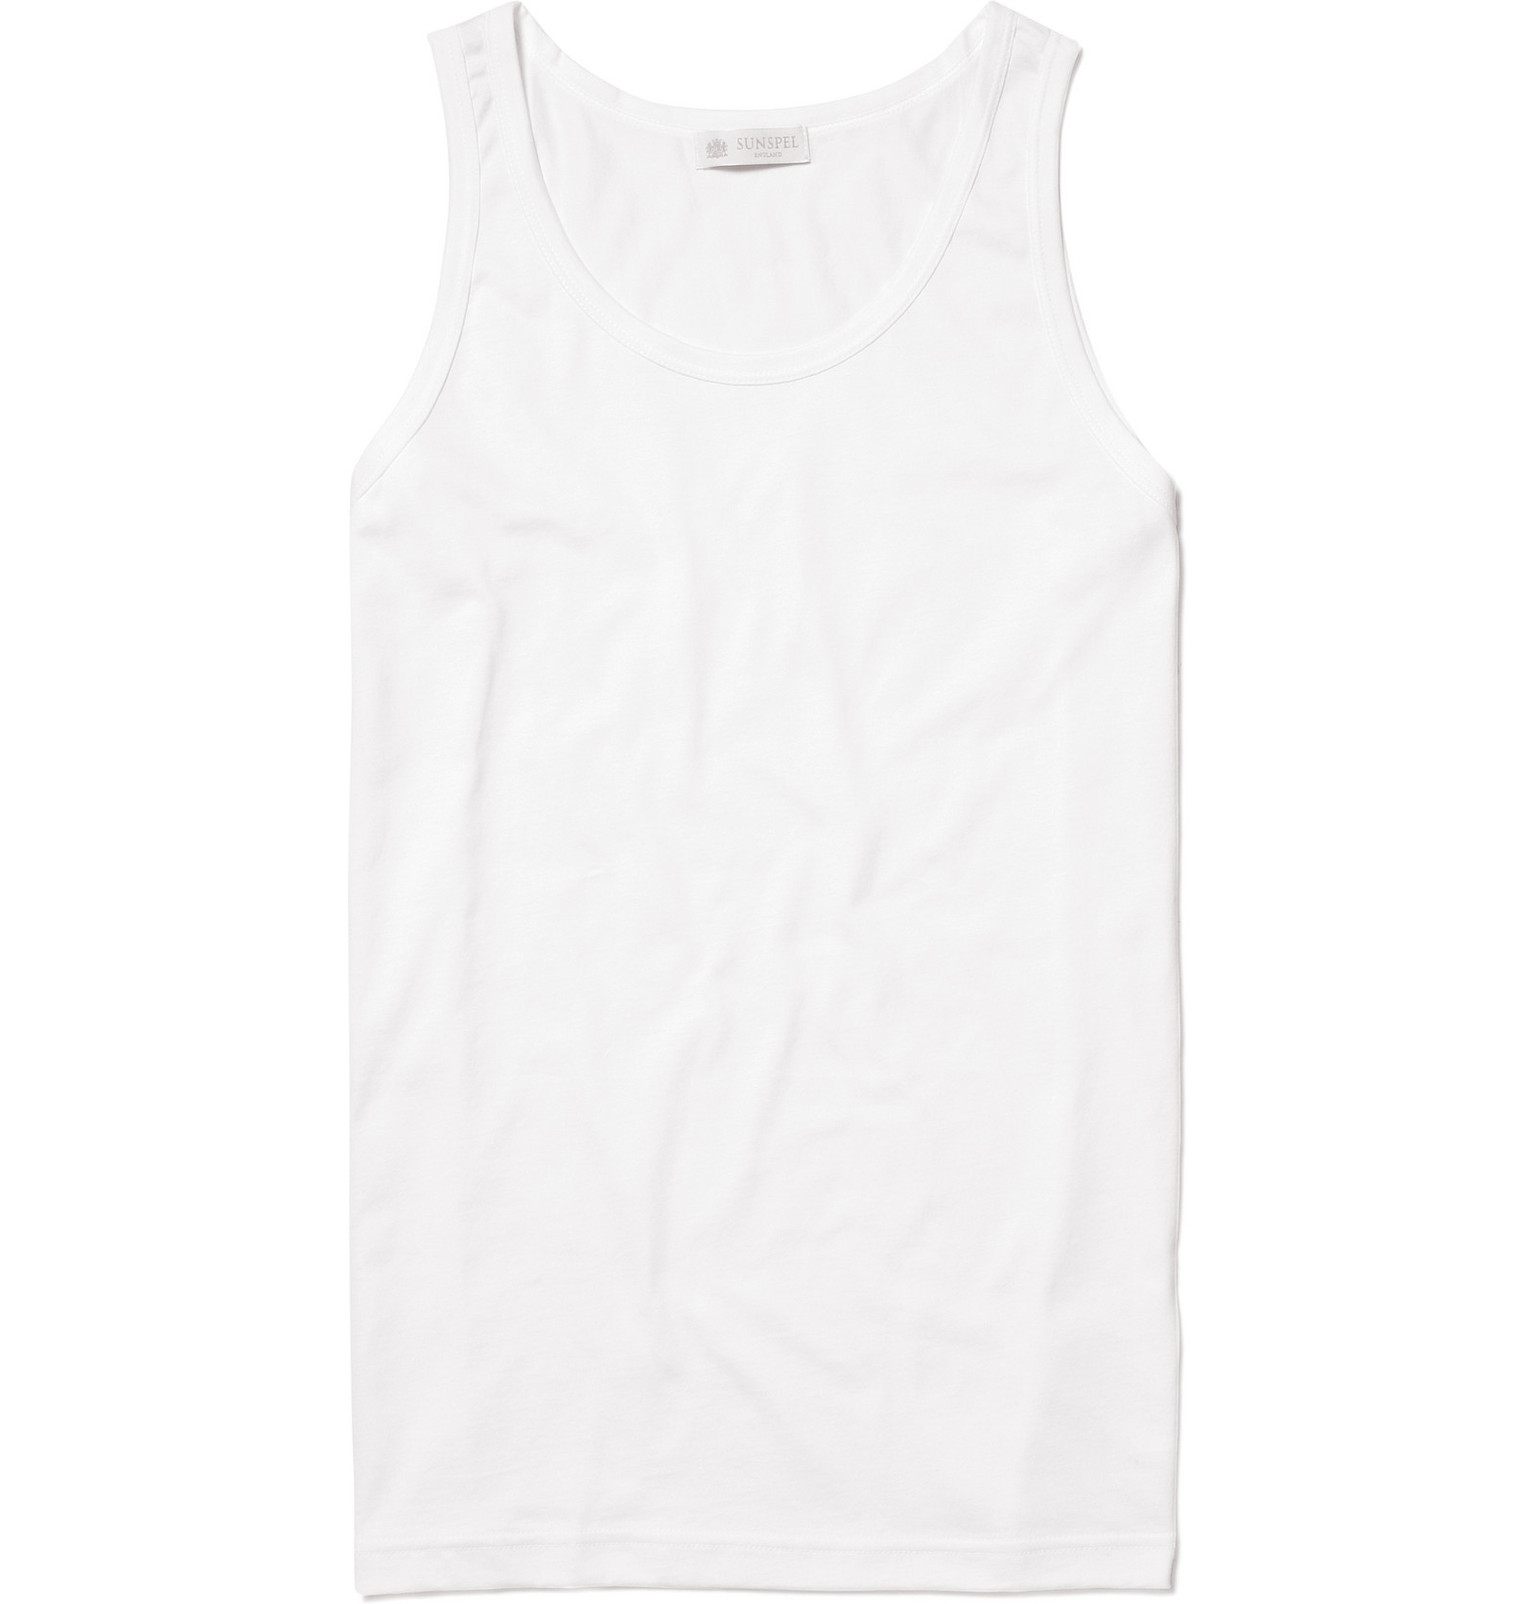 Camiseta tirantes Sunspelcotton Sunspelcotton tirantes de Camiseta Underwear de UFqwtqd